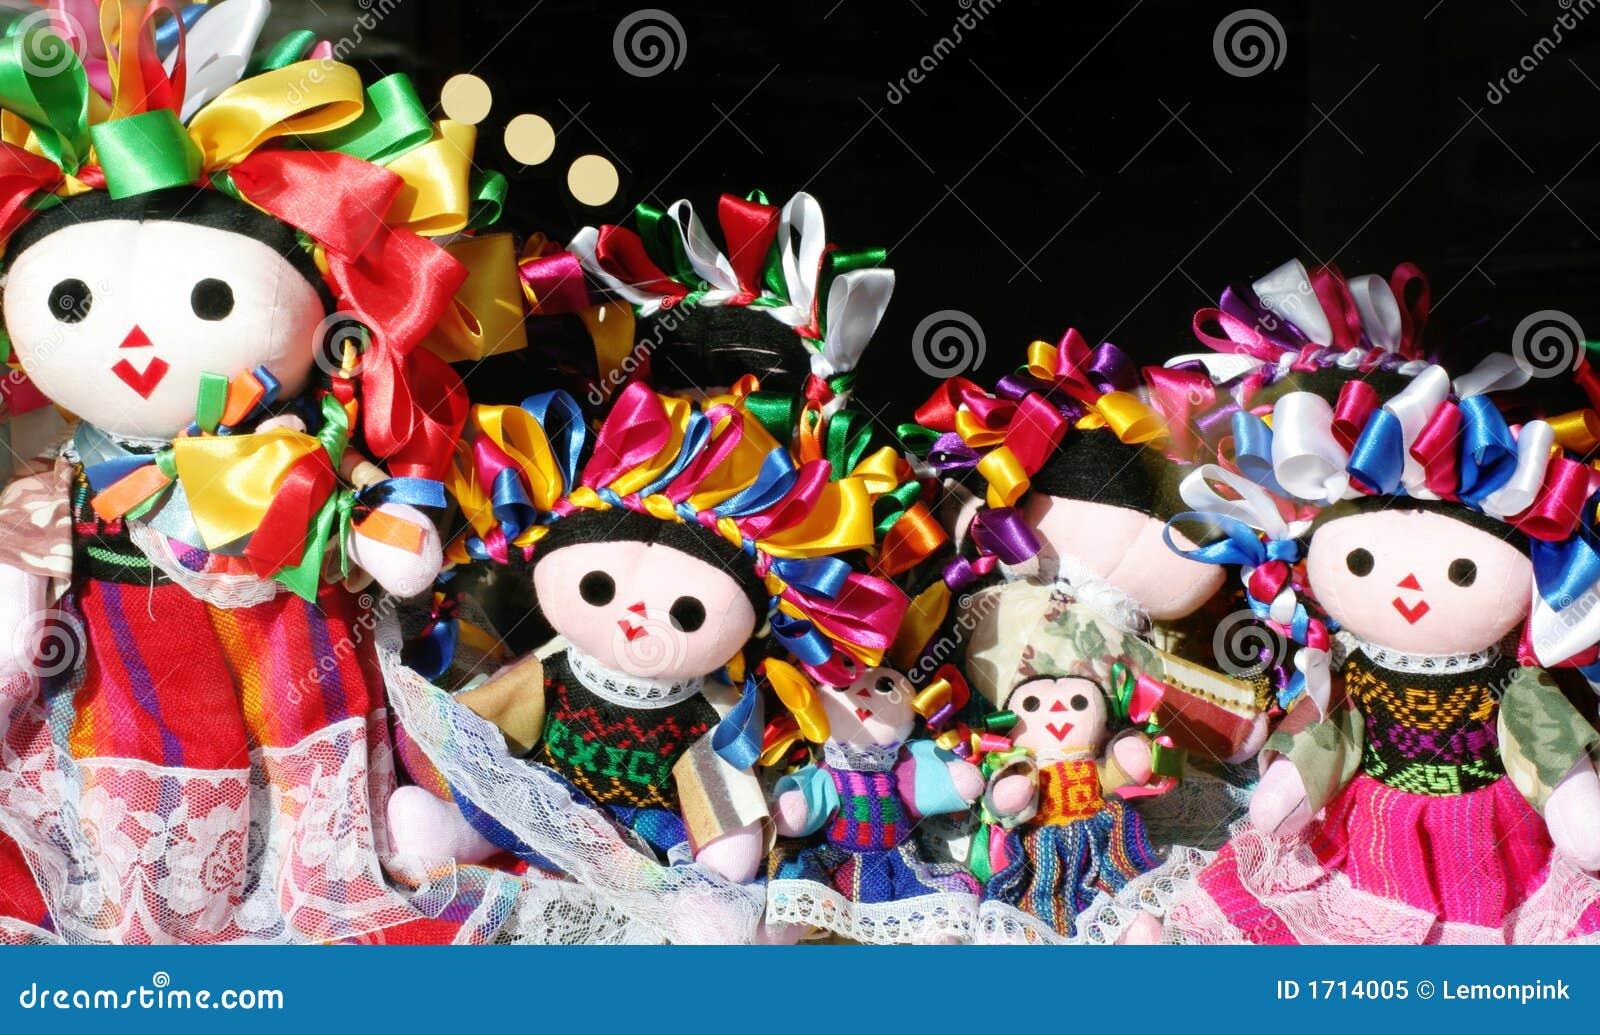 Meksykańskie lalki.